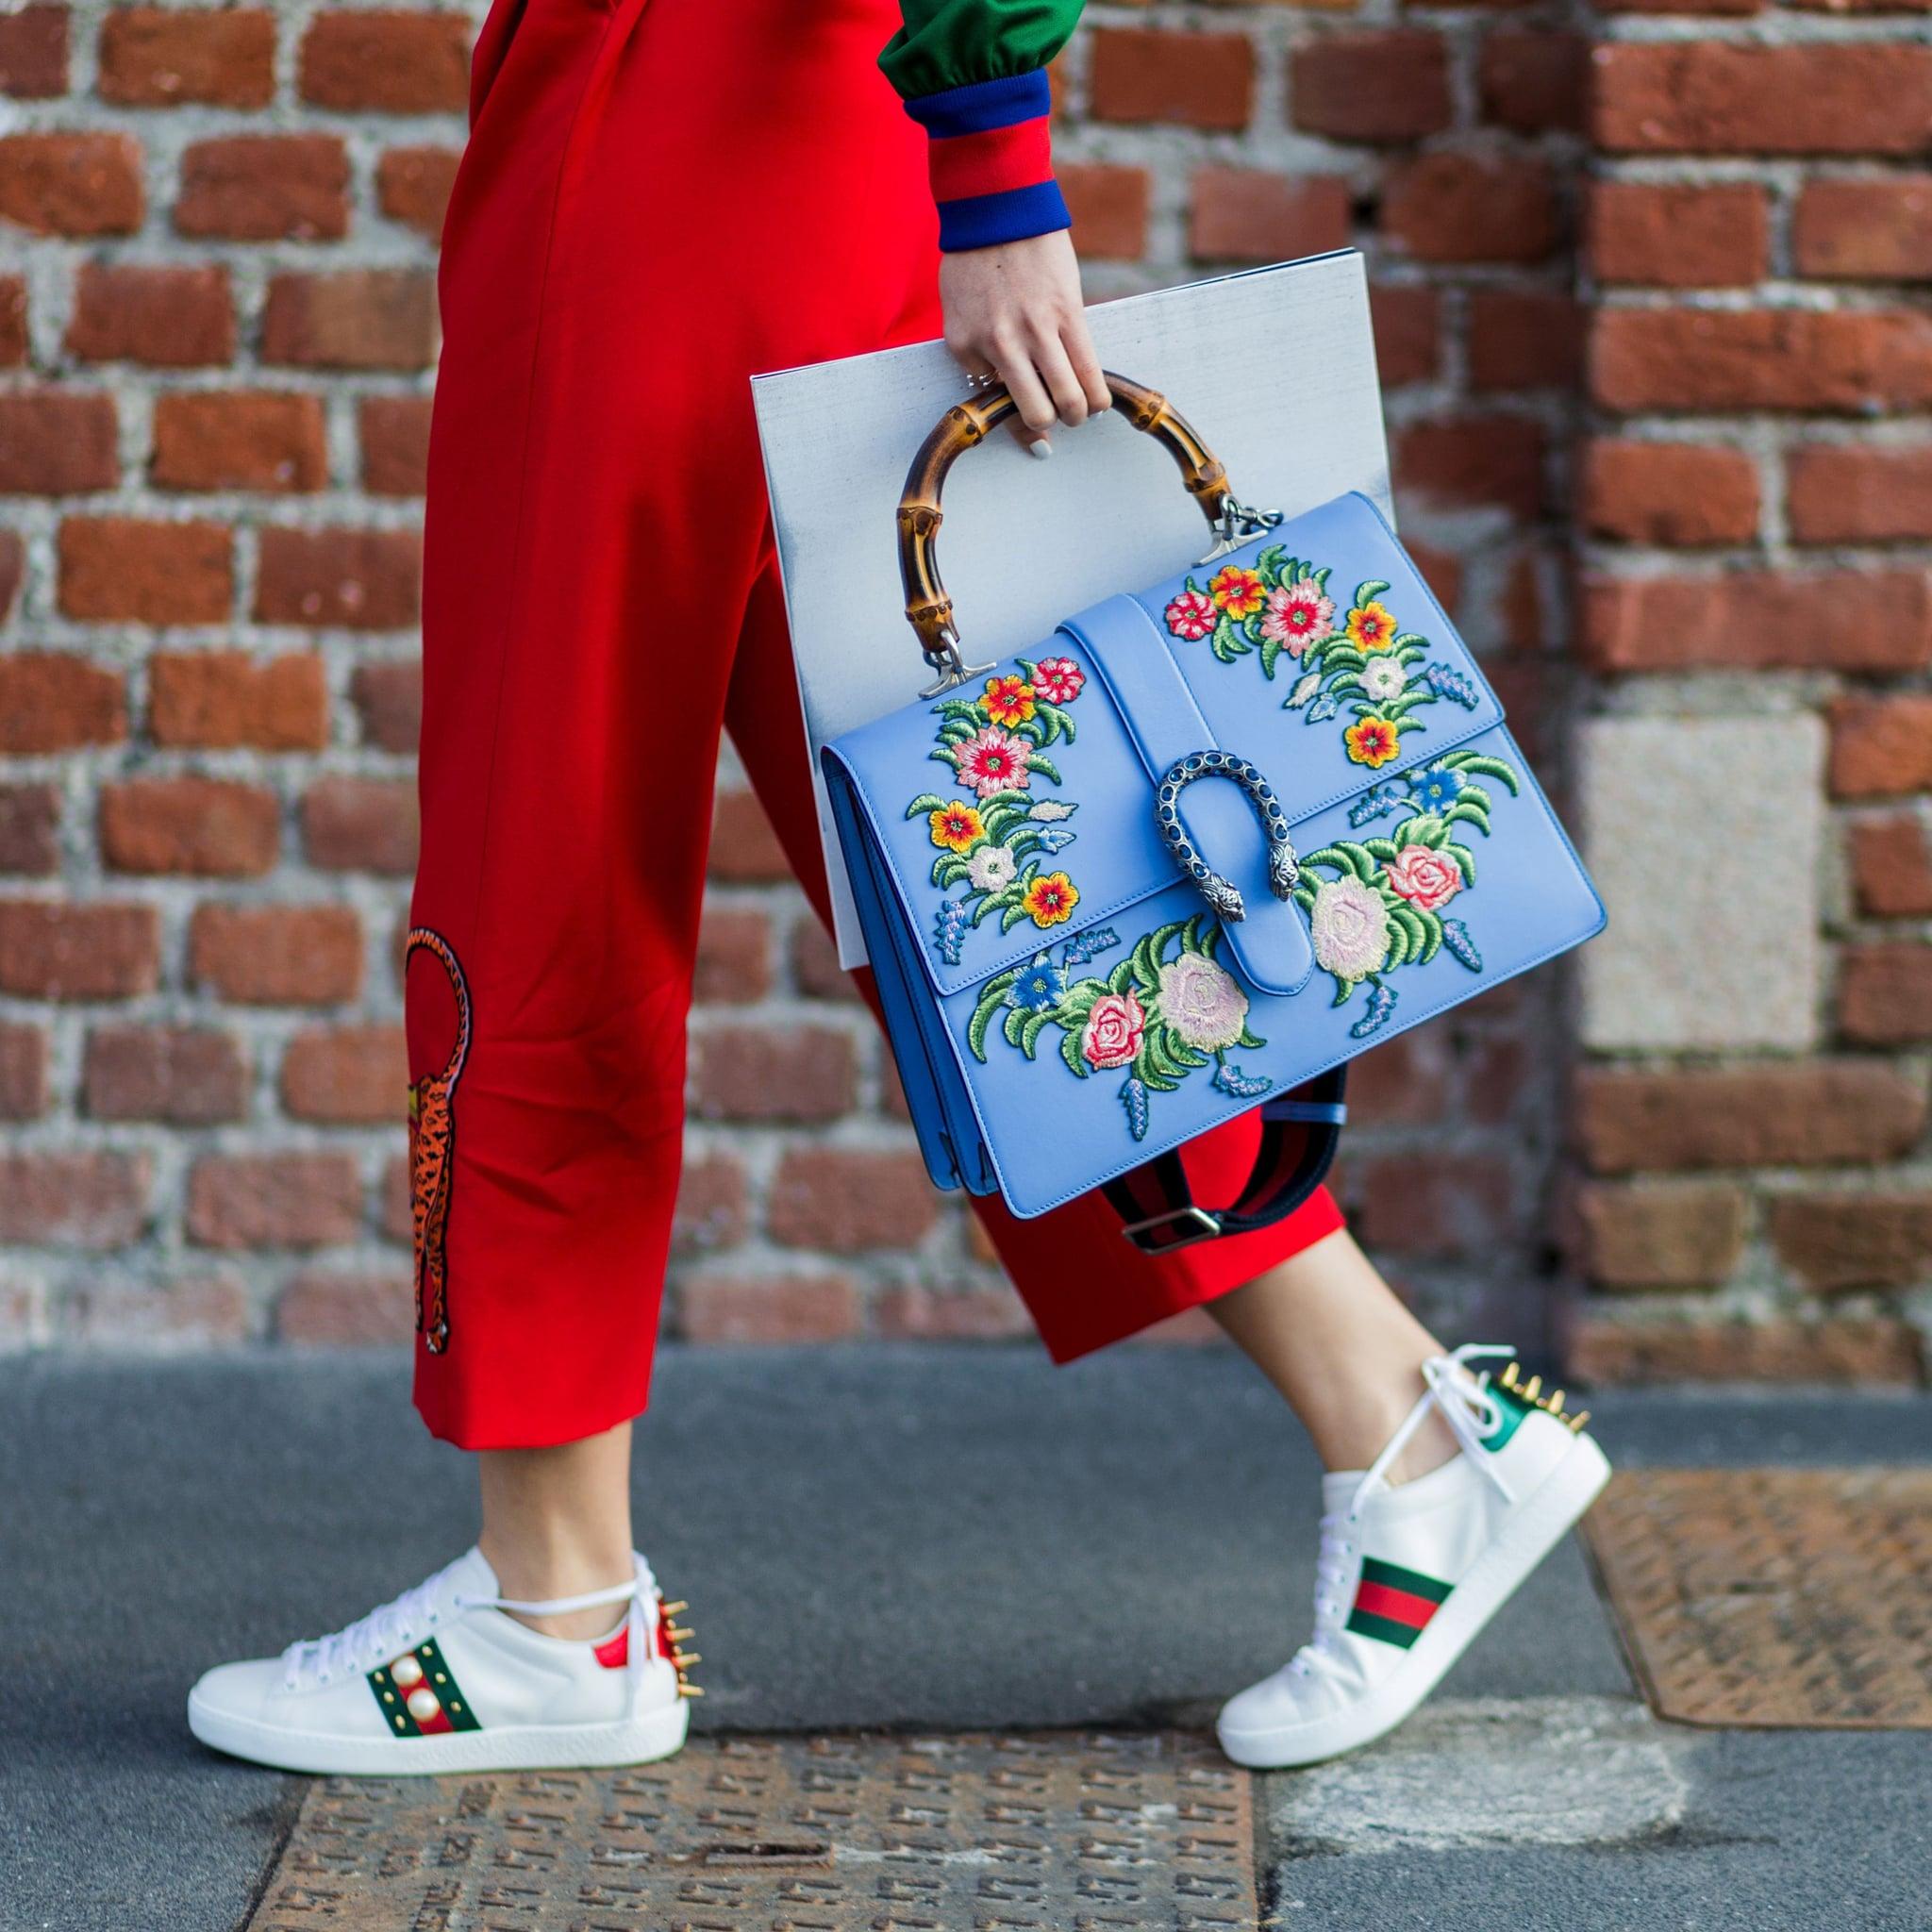 Resultado de imagem para street style sneakers 2017